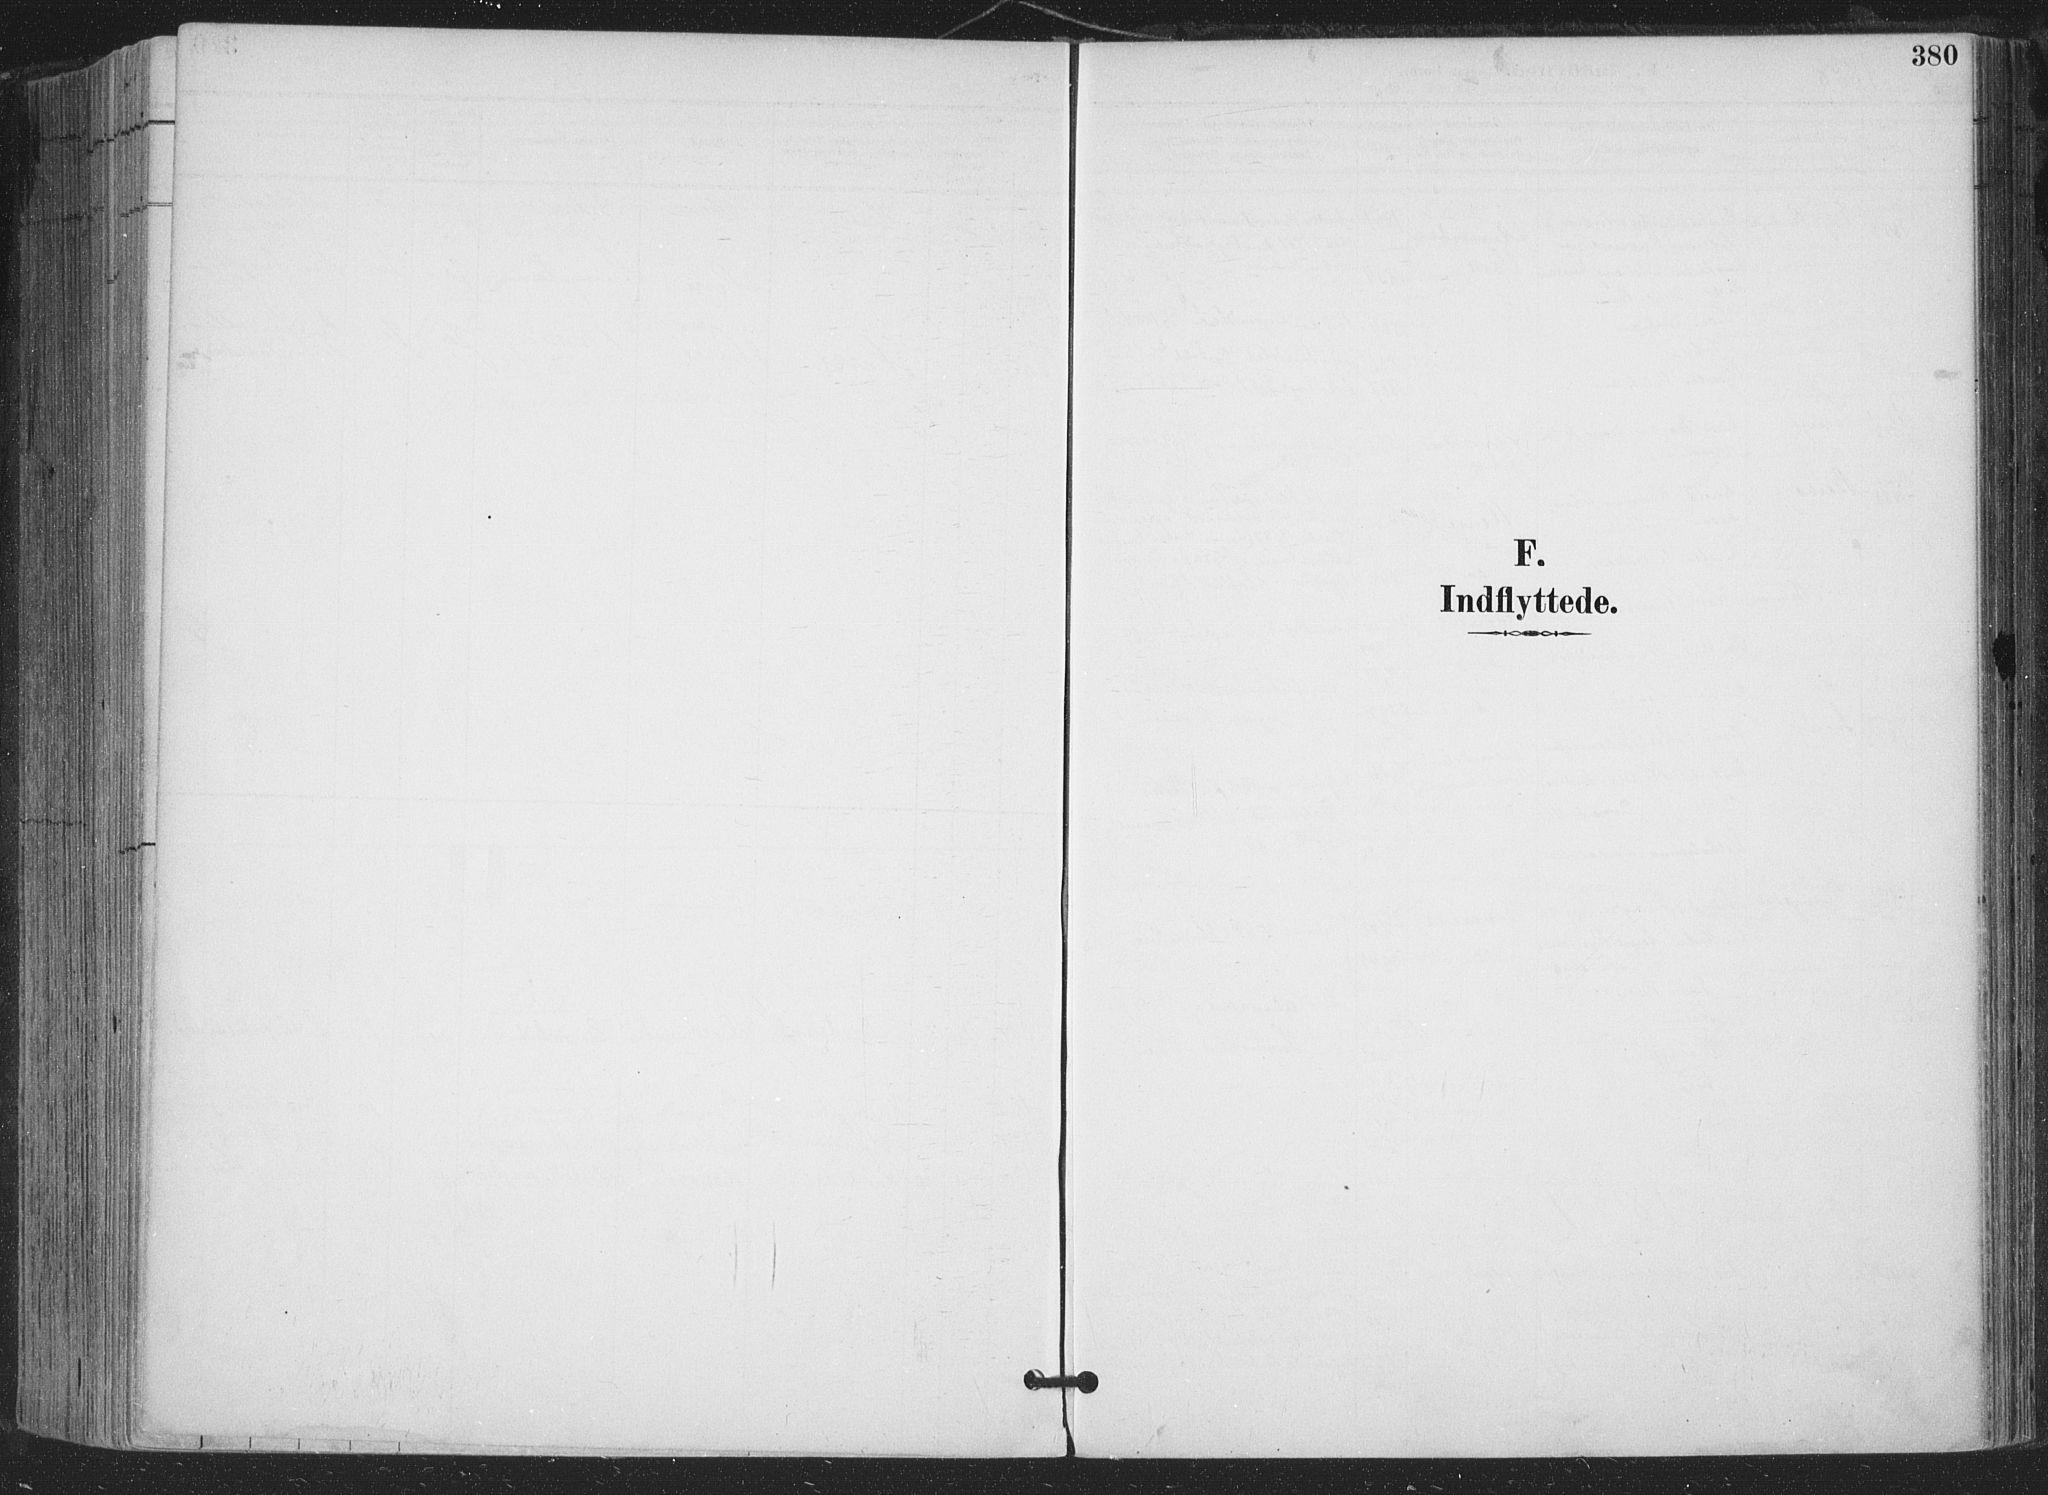 SAKO, Bamble kirkebøker, F/Fa/L0008: Ministerialbok nr. I 8, 1888-1900, s. 380